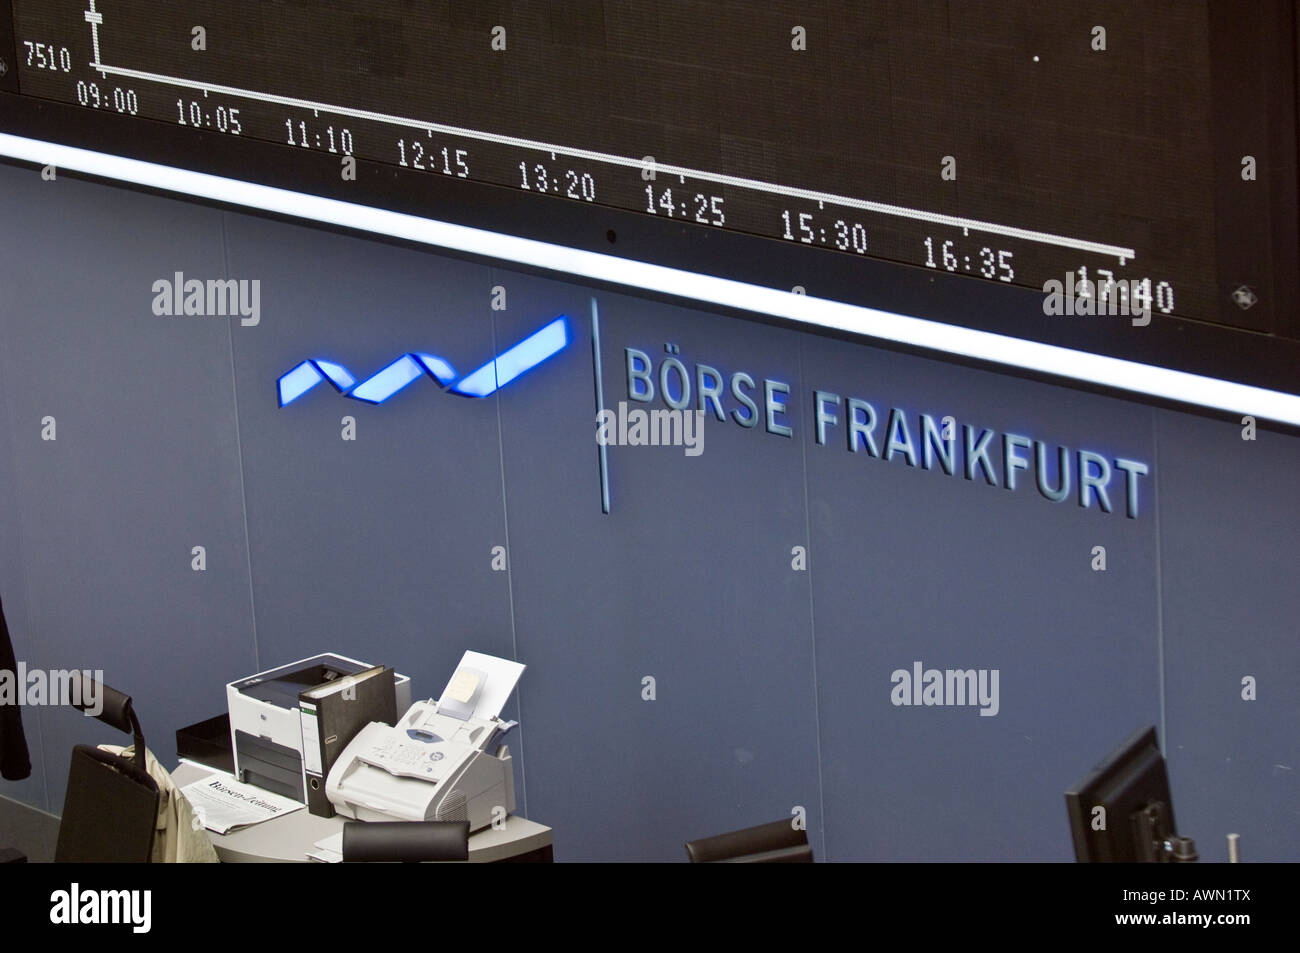 Overhead information sign listing website and opening hours at Frankfurt Stock Exchange, Frankfurt, Hesse, Germany, Europe Stock Photo